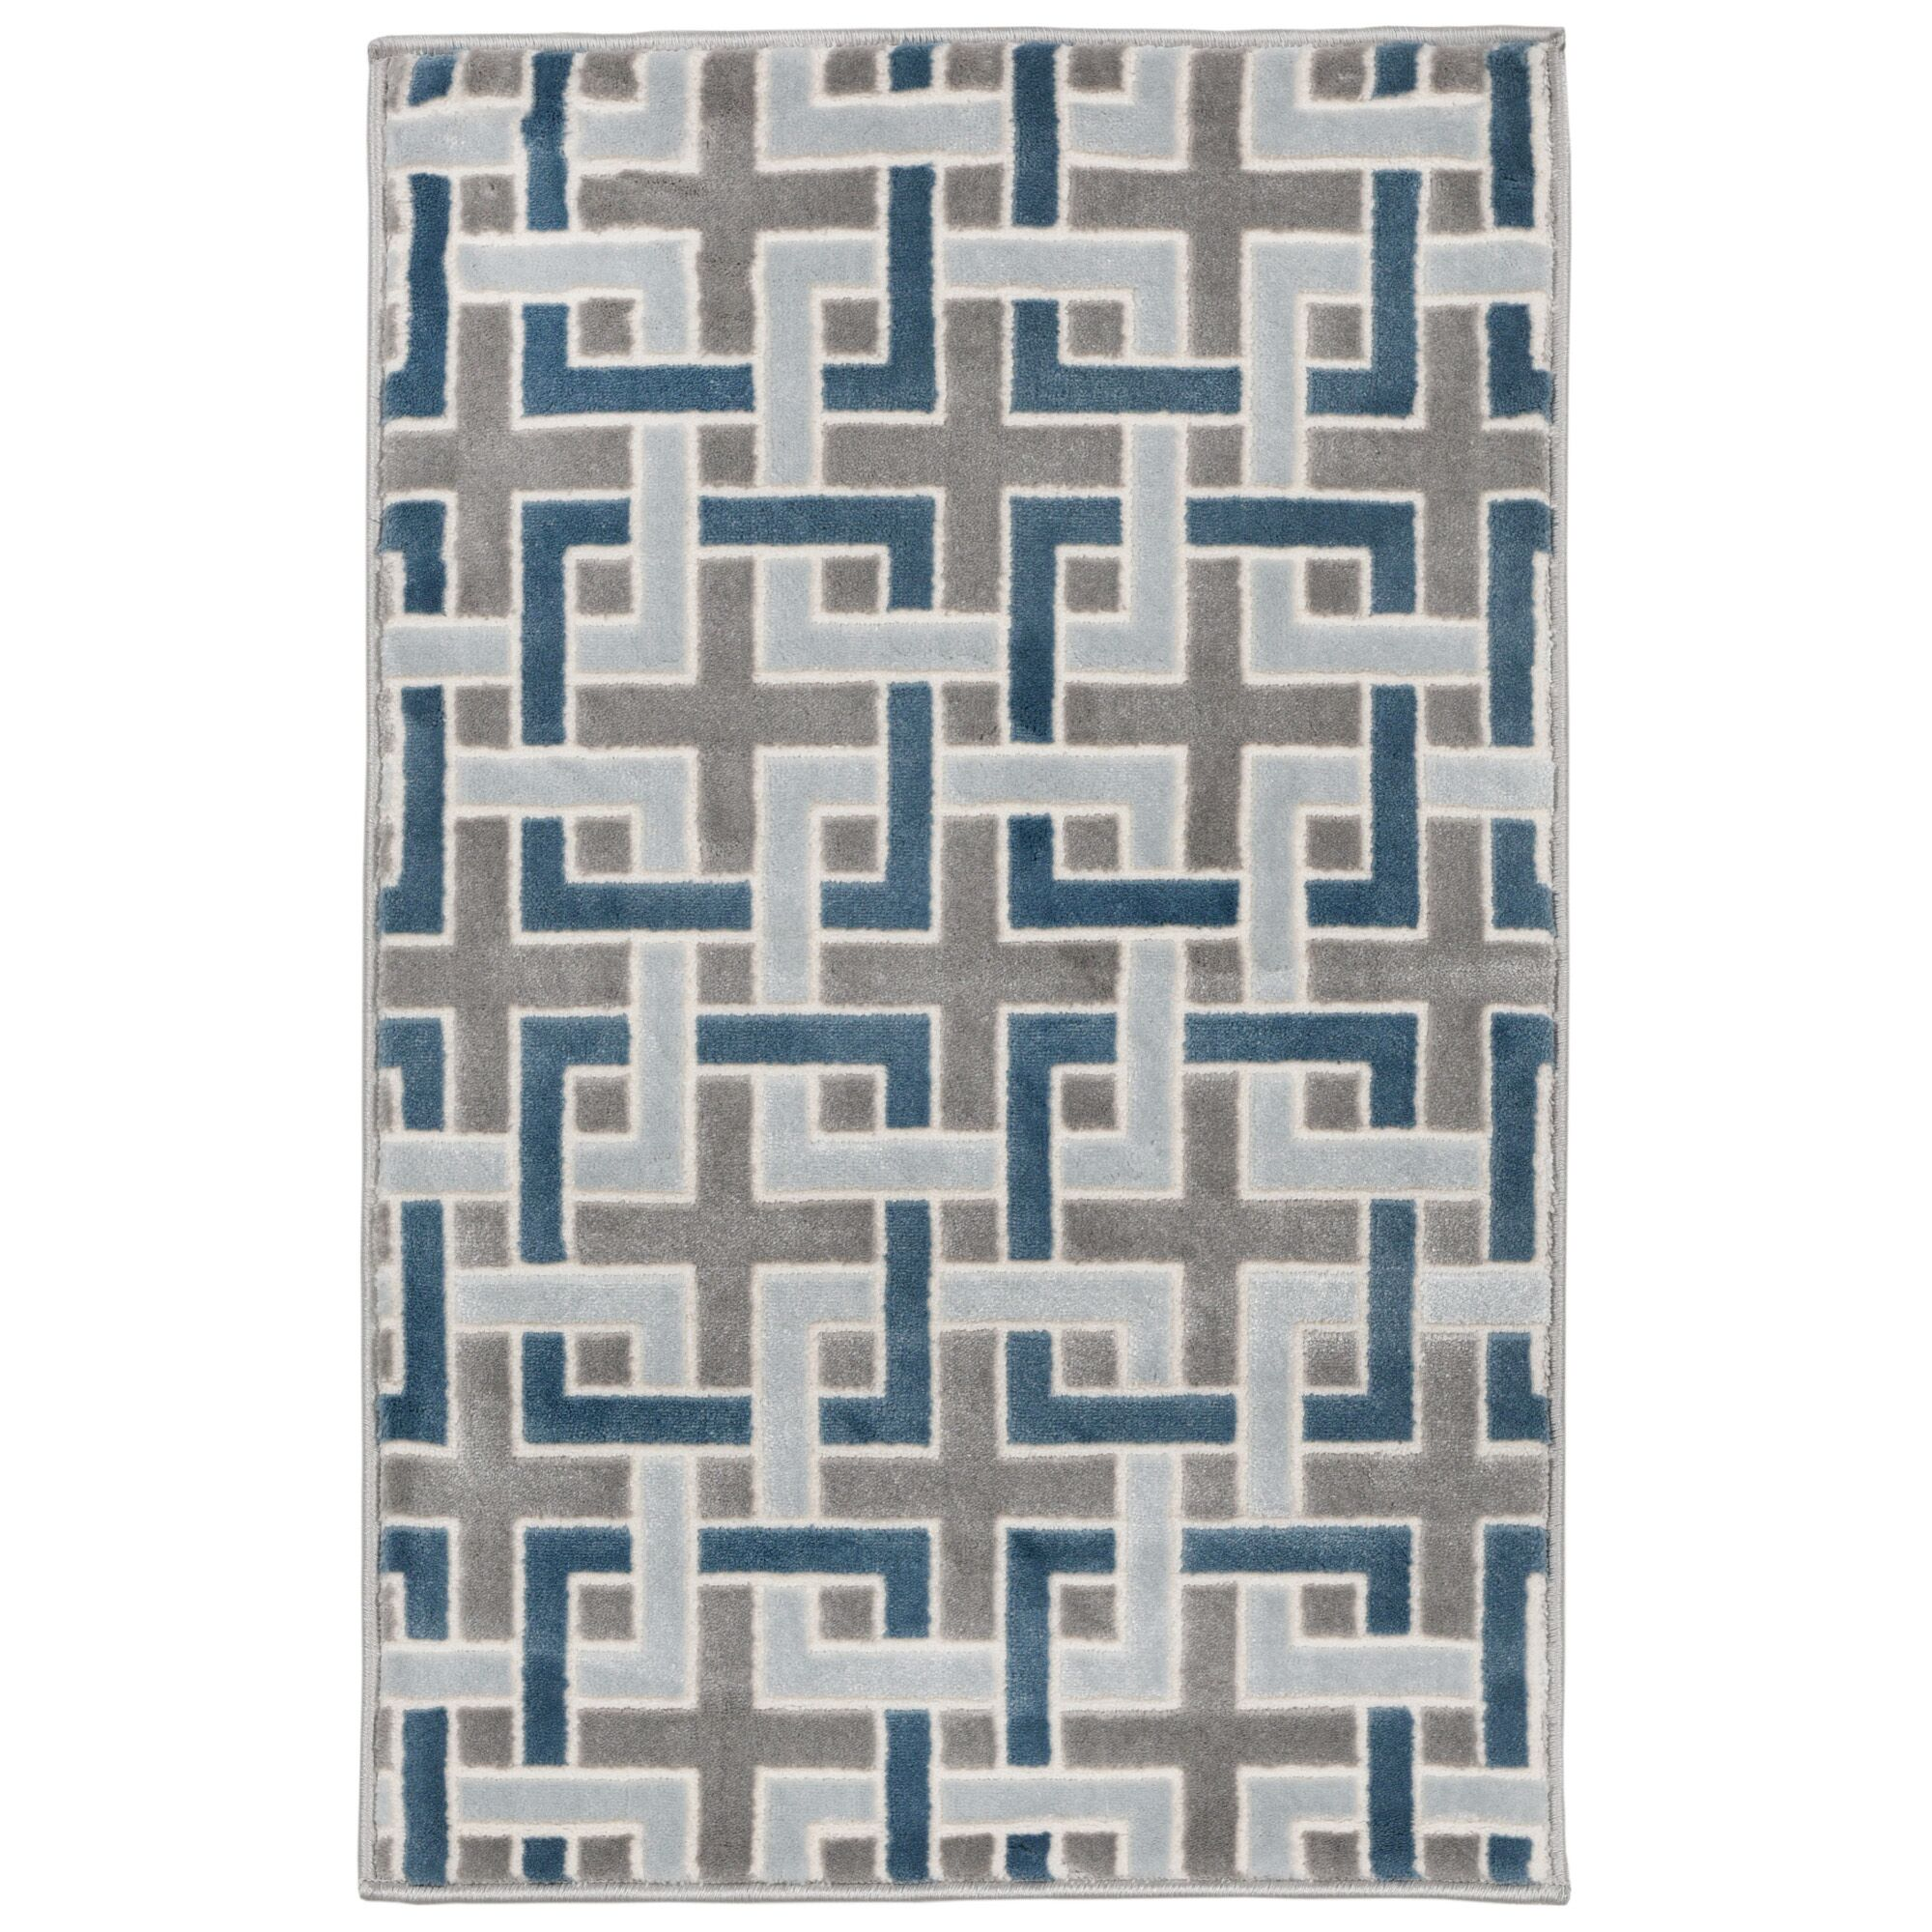 Kari Deco Blue/Gray Area Rug Rug Size: Rectangle 4'10